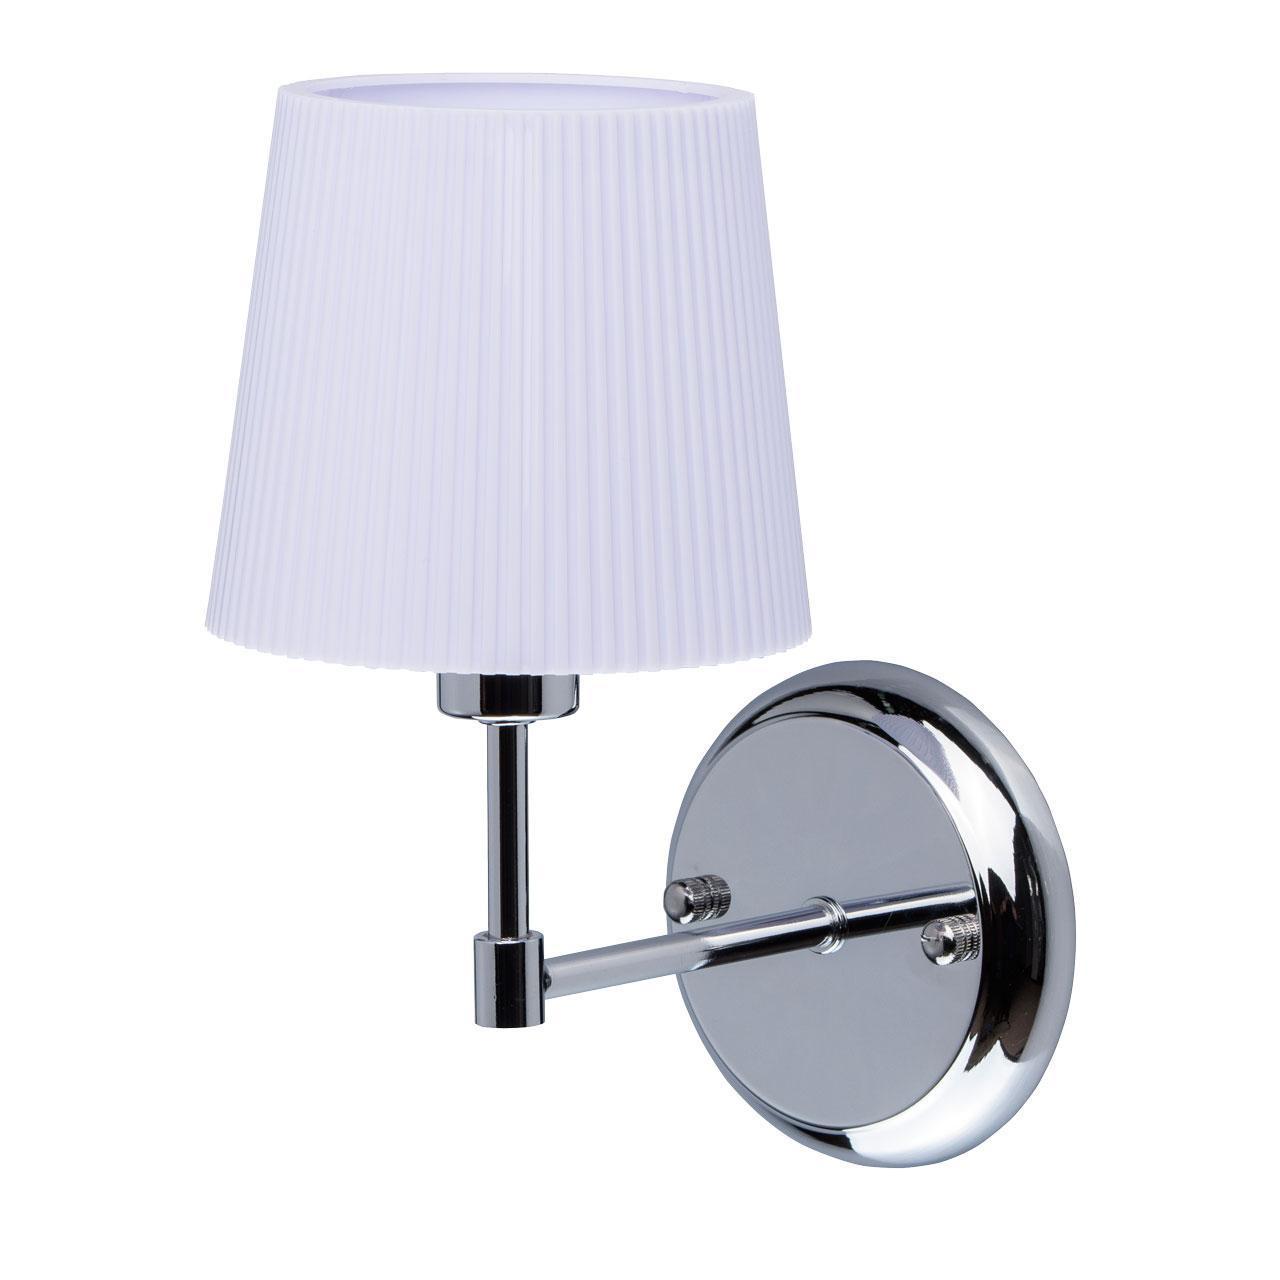 Бра MW-Light Лацио 1 103020101 бра mw light лацио 4 103021001